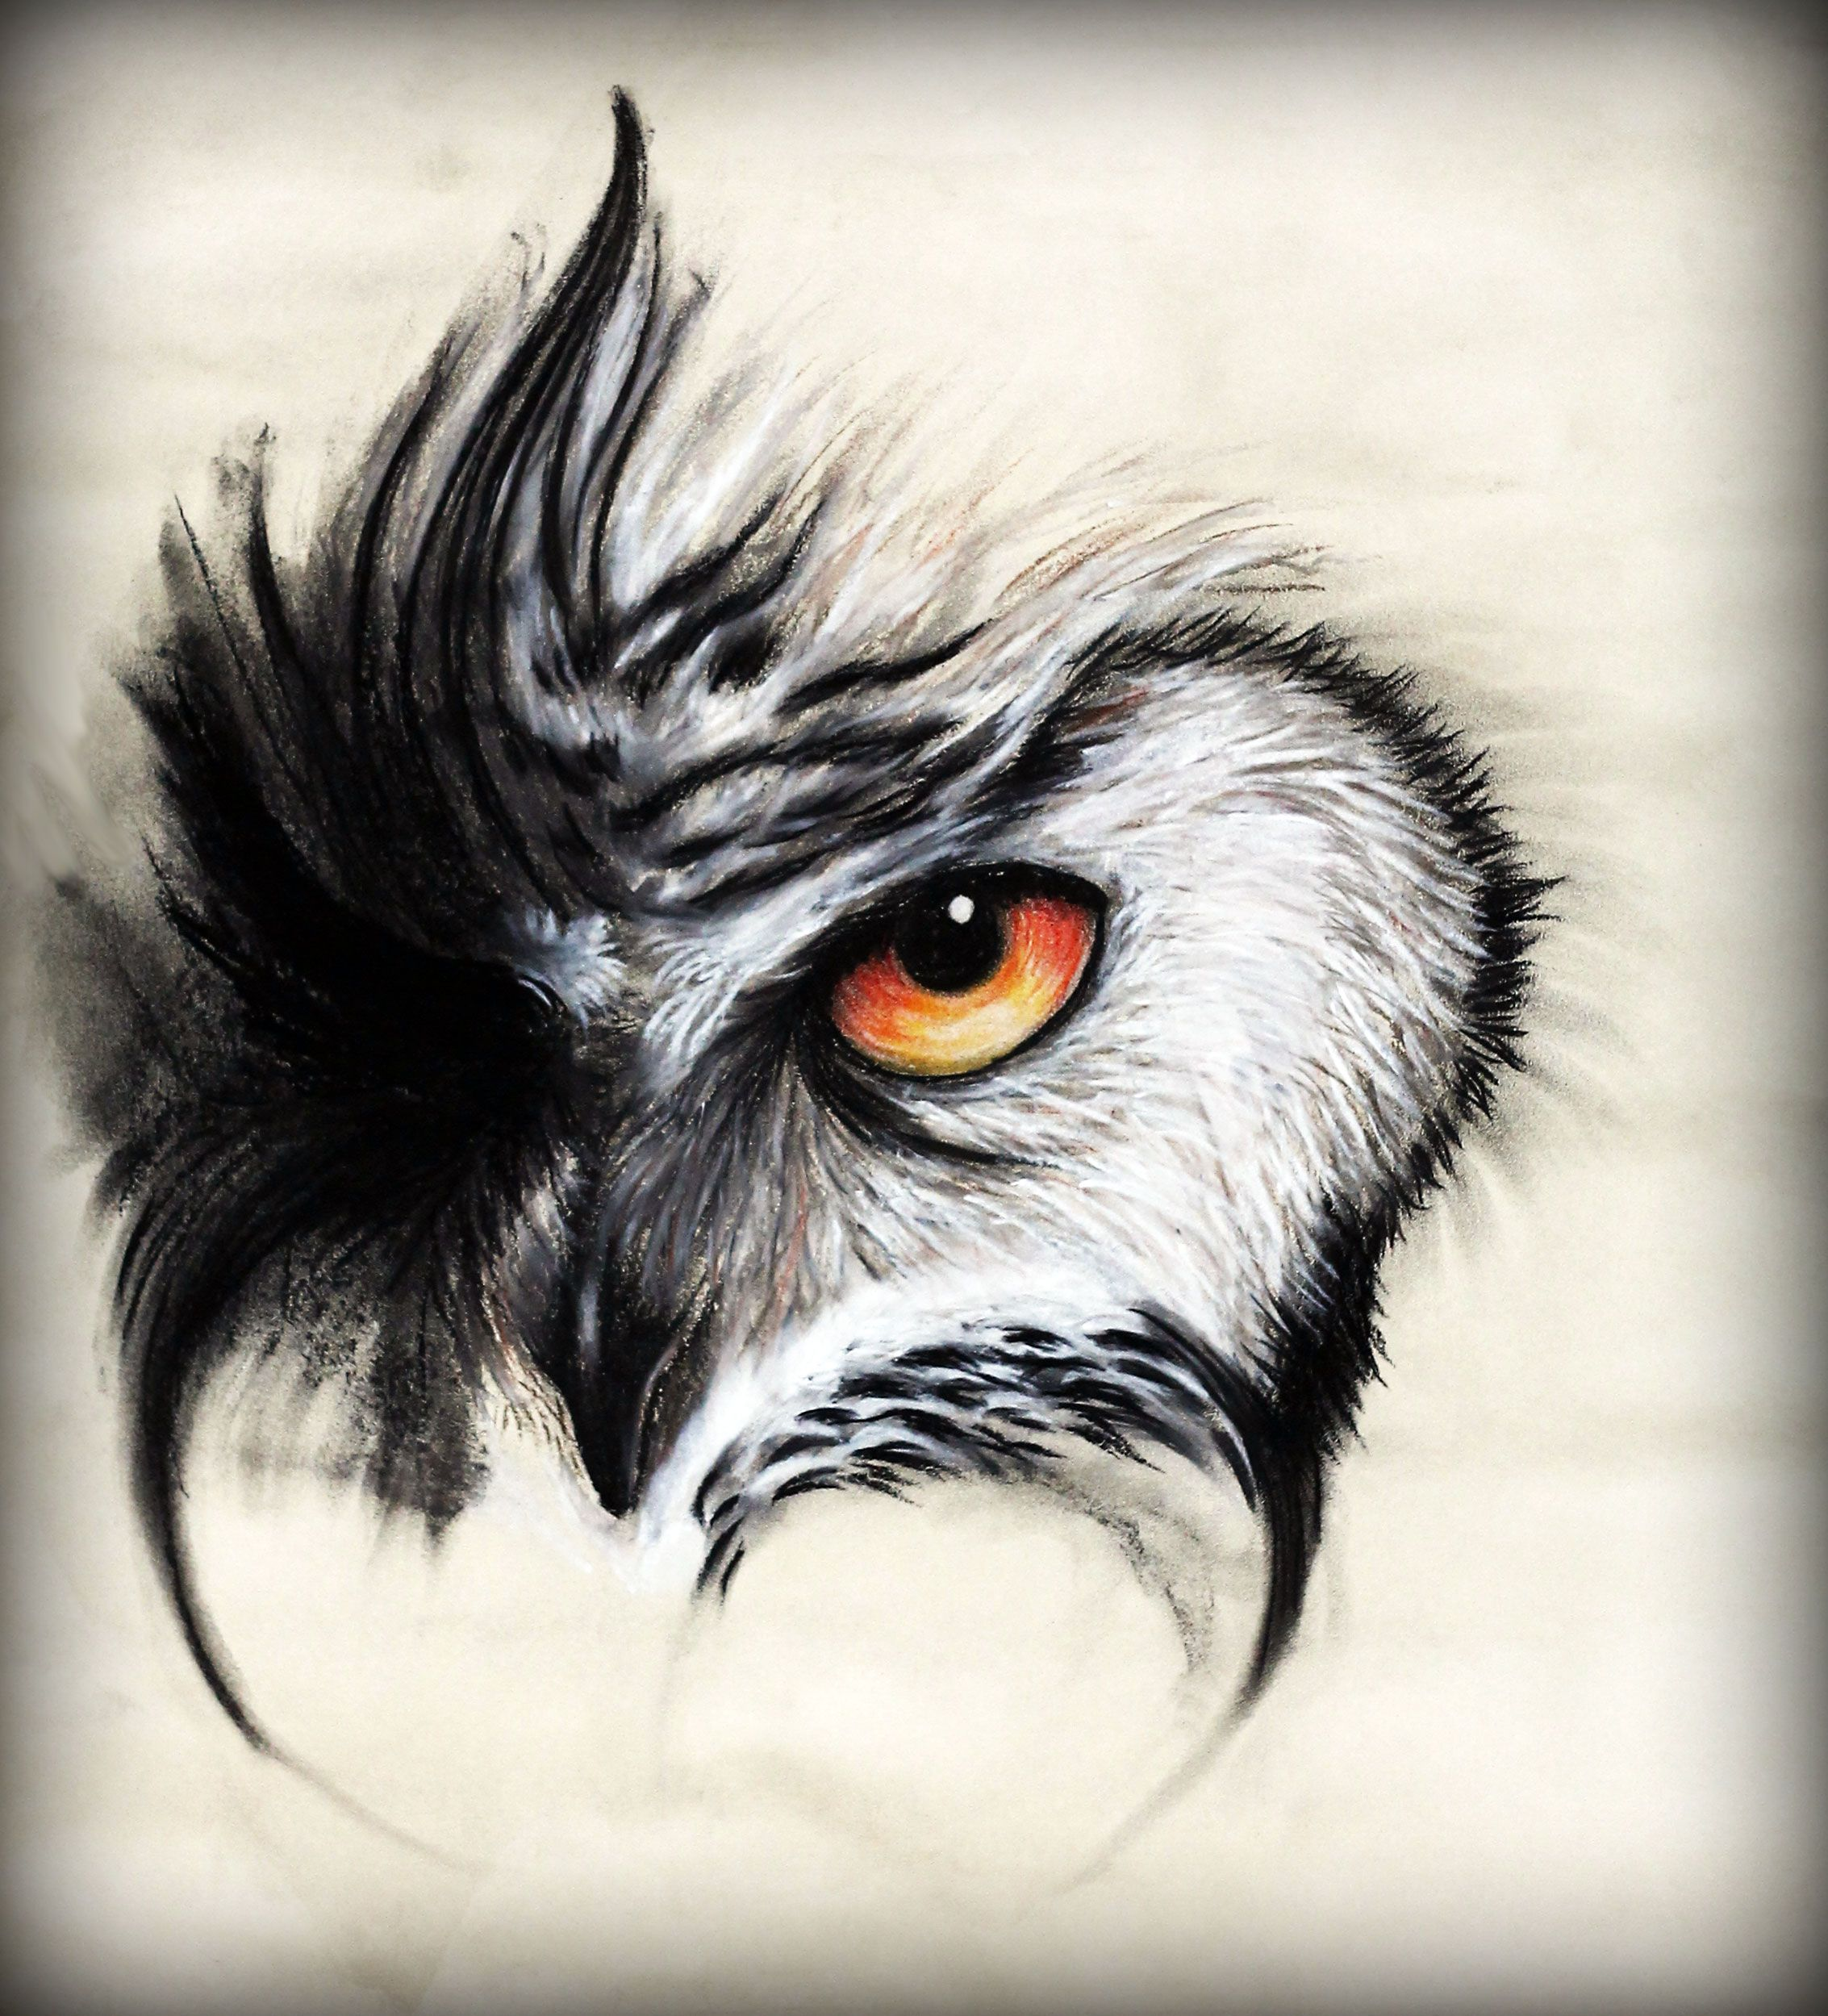 Pin by Phillip Jones on Tattoos Owl eye tattoo, Owl